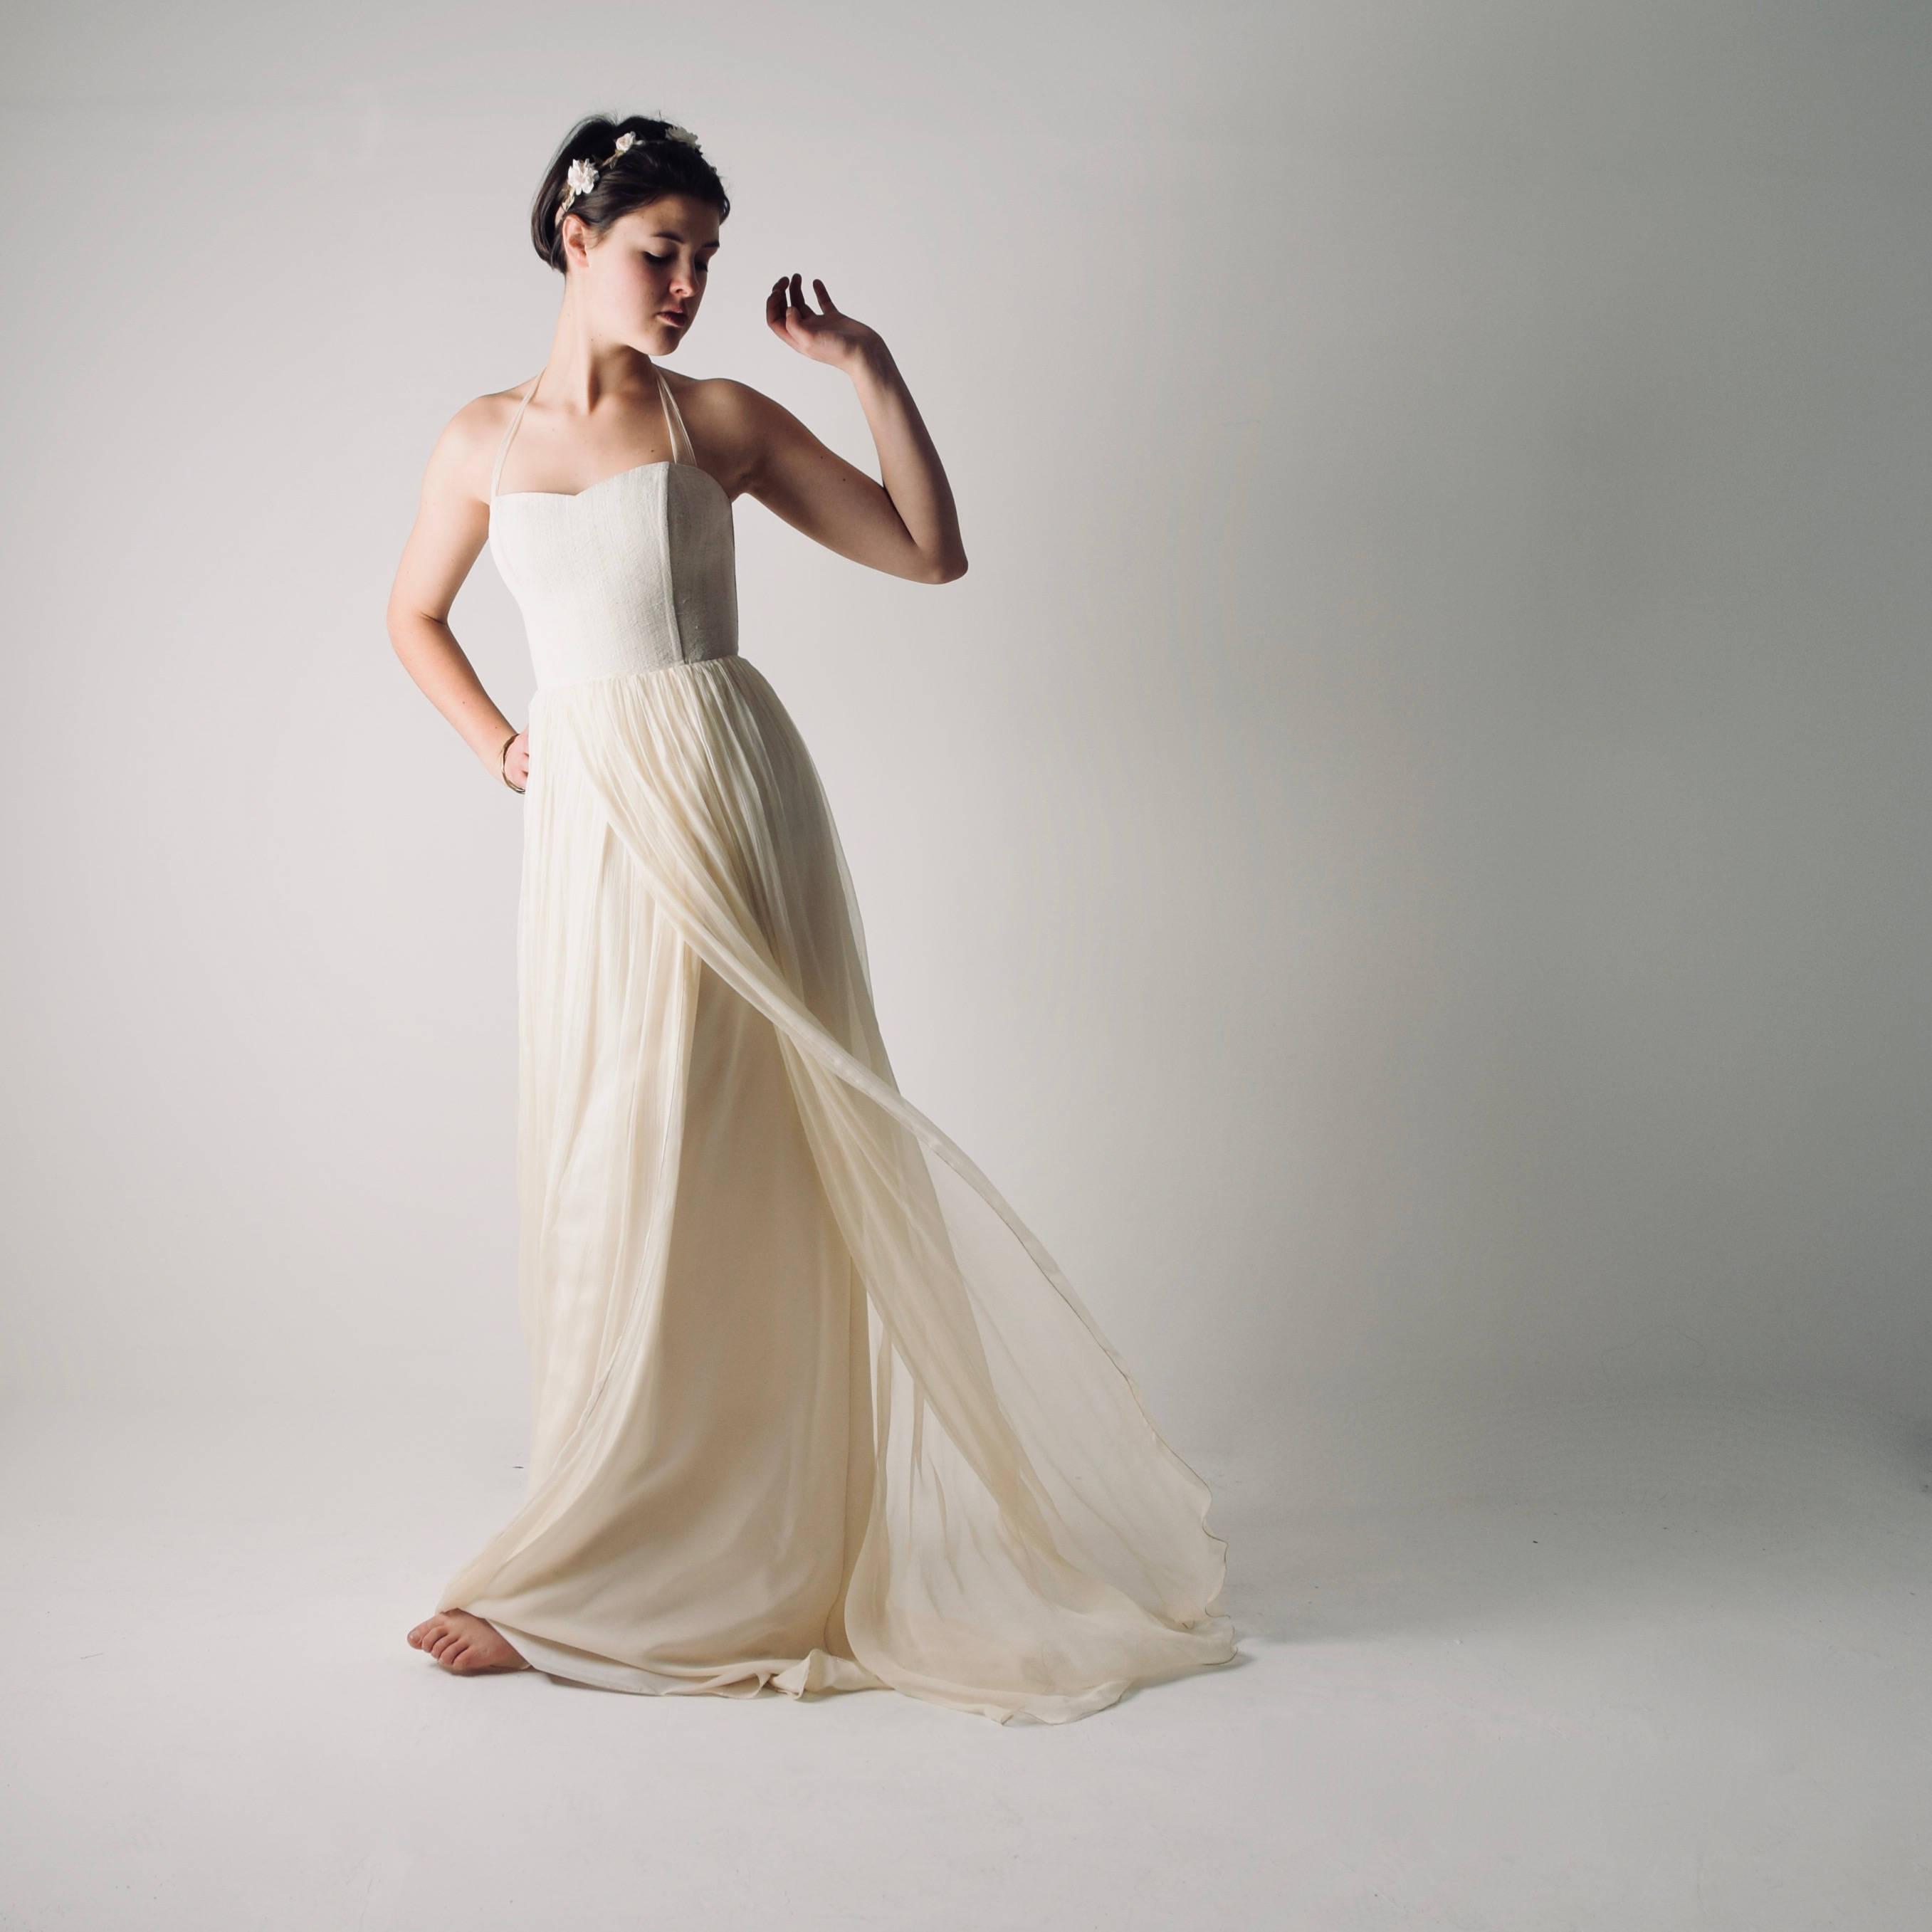 Hemp Dress -cannabis clothing- Hemp clothing -organic dress boho dress linen dress eco fashion tunic dress hemp shirt